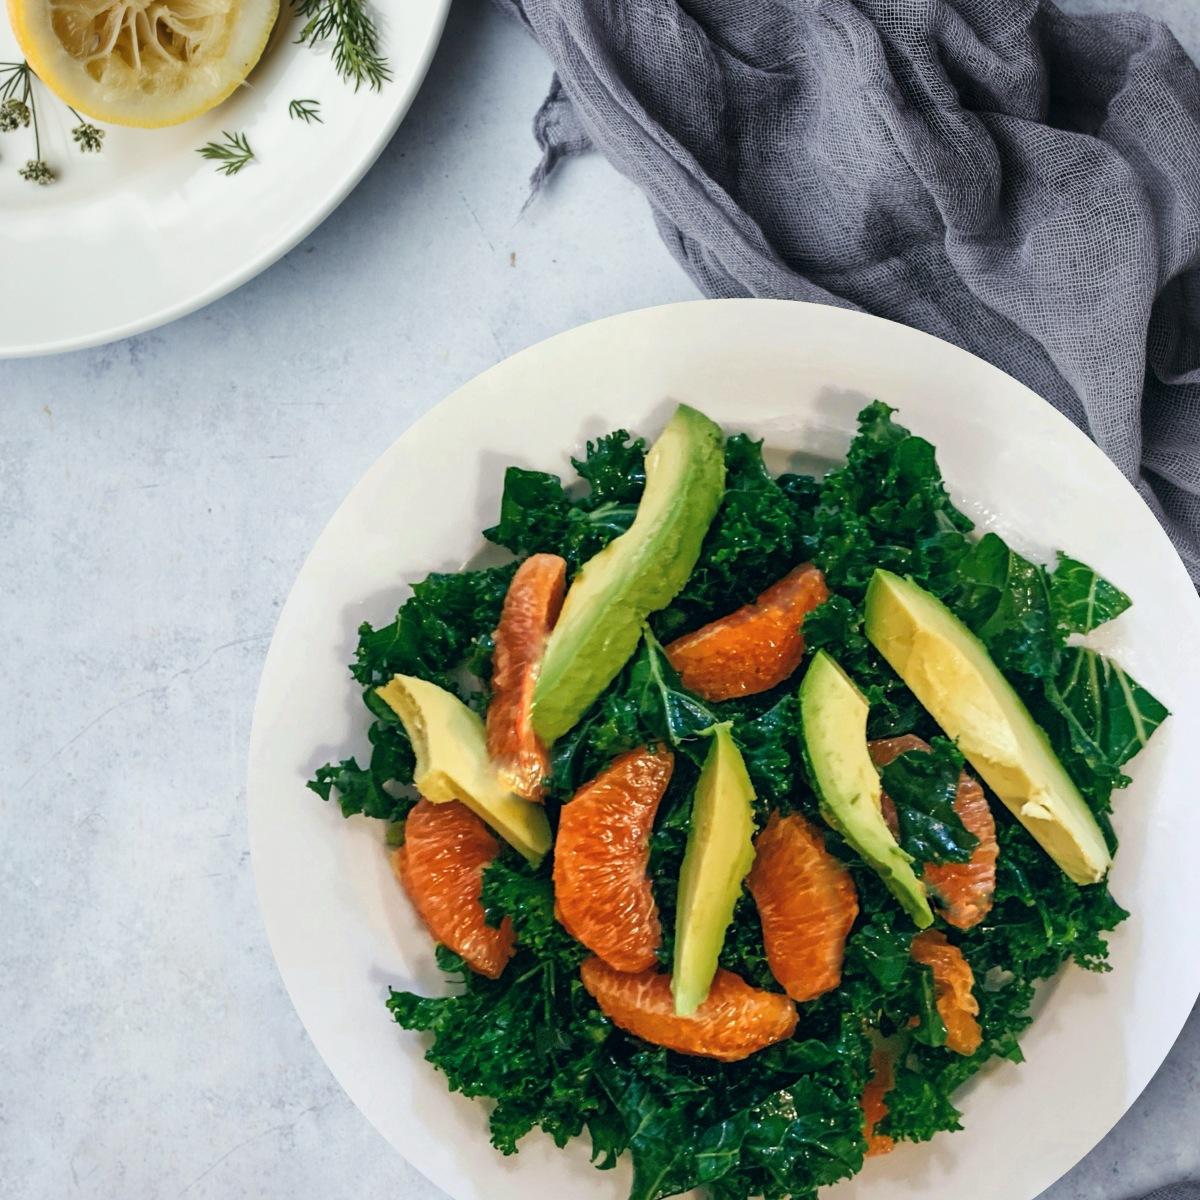 Kale, Orange, Avocado salad with ginger limedressing